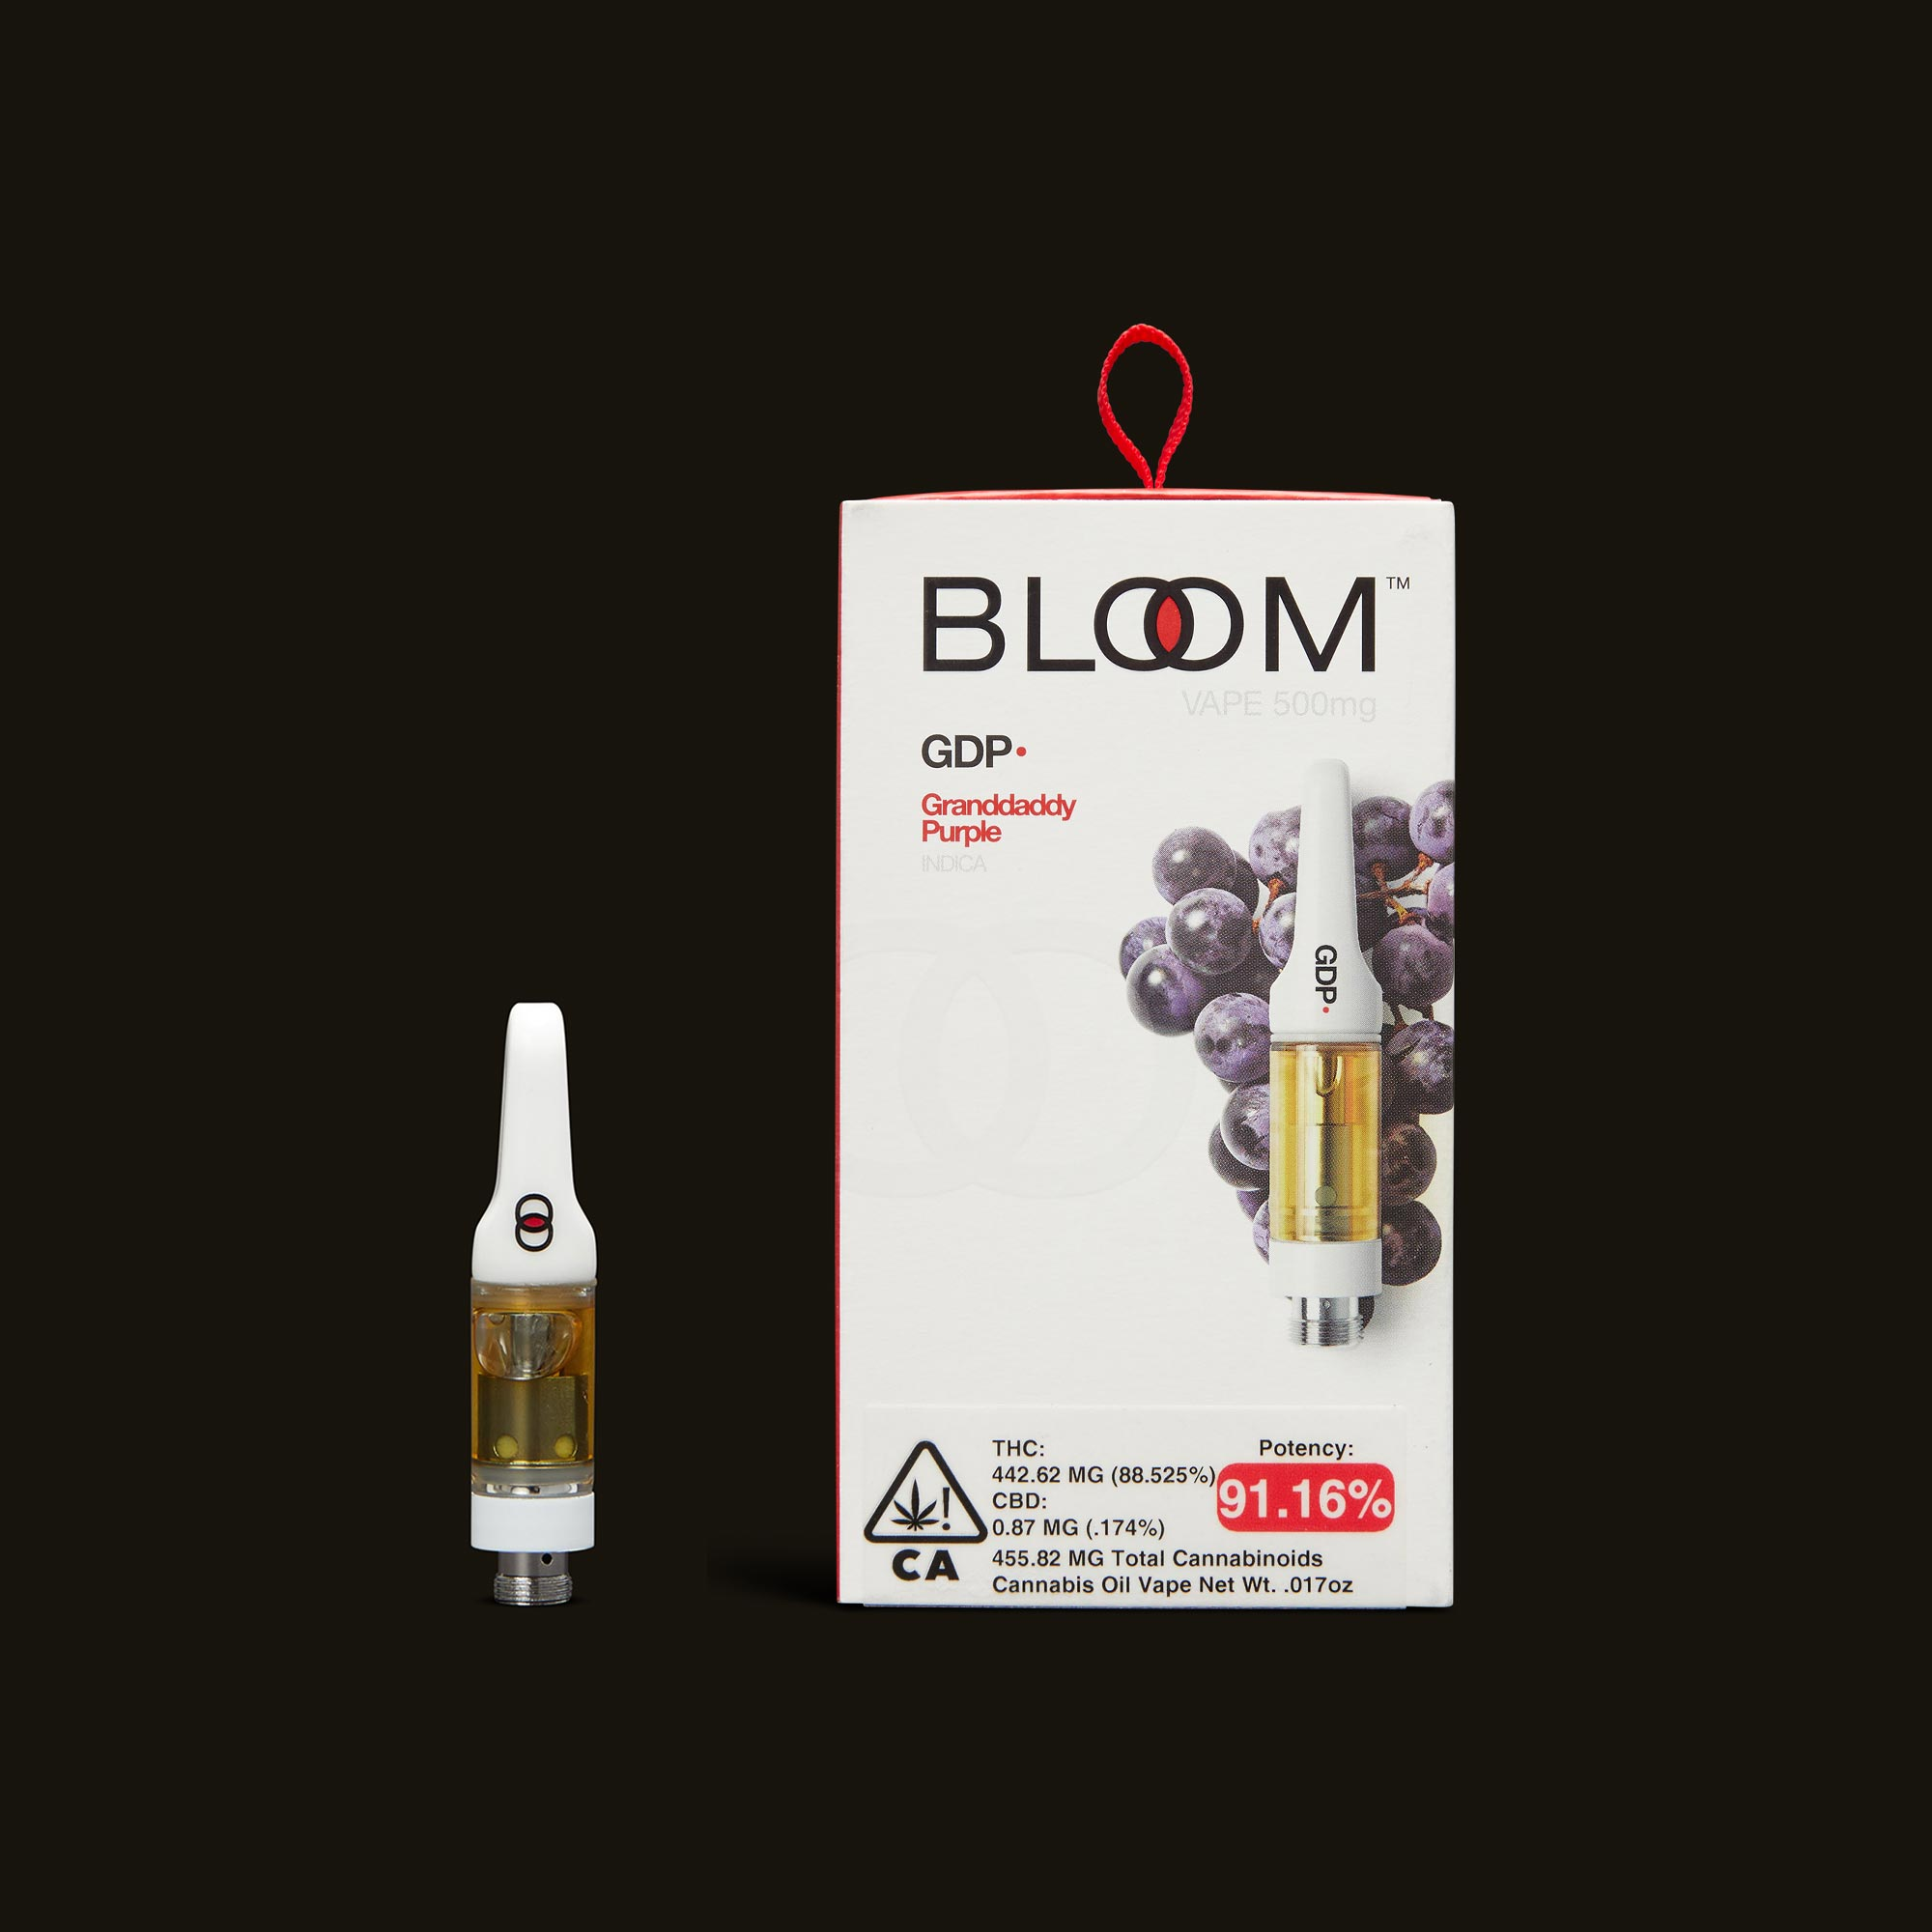 Granddaddy Purple Cartridge - 1g by Bloom Brands